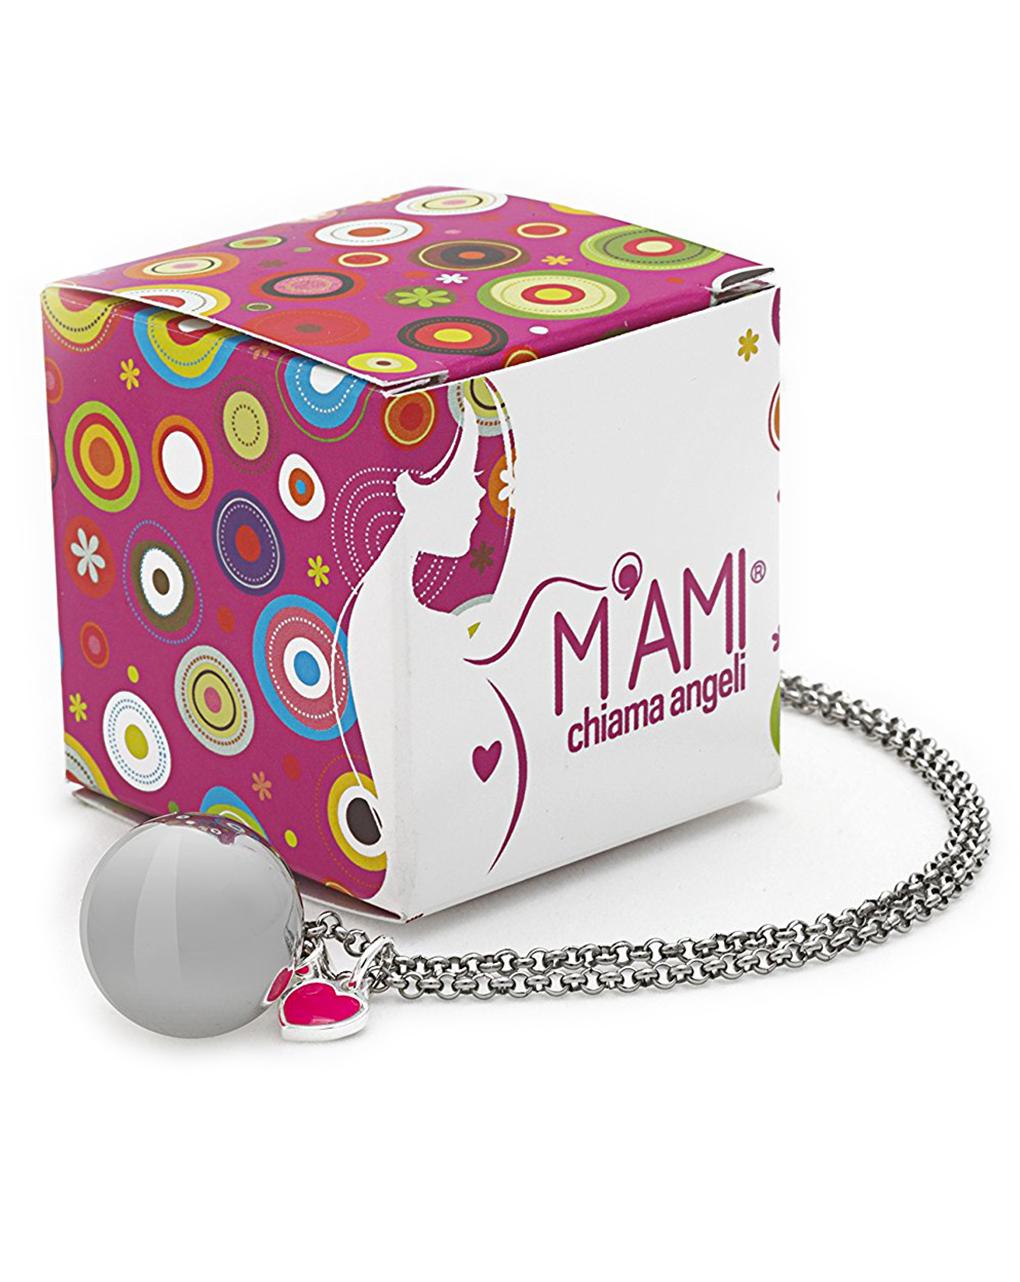 Chiama angeli pink heart - Mamijux